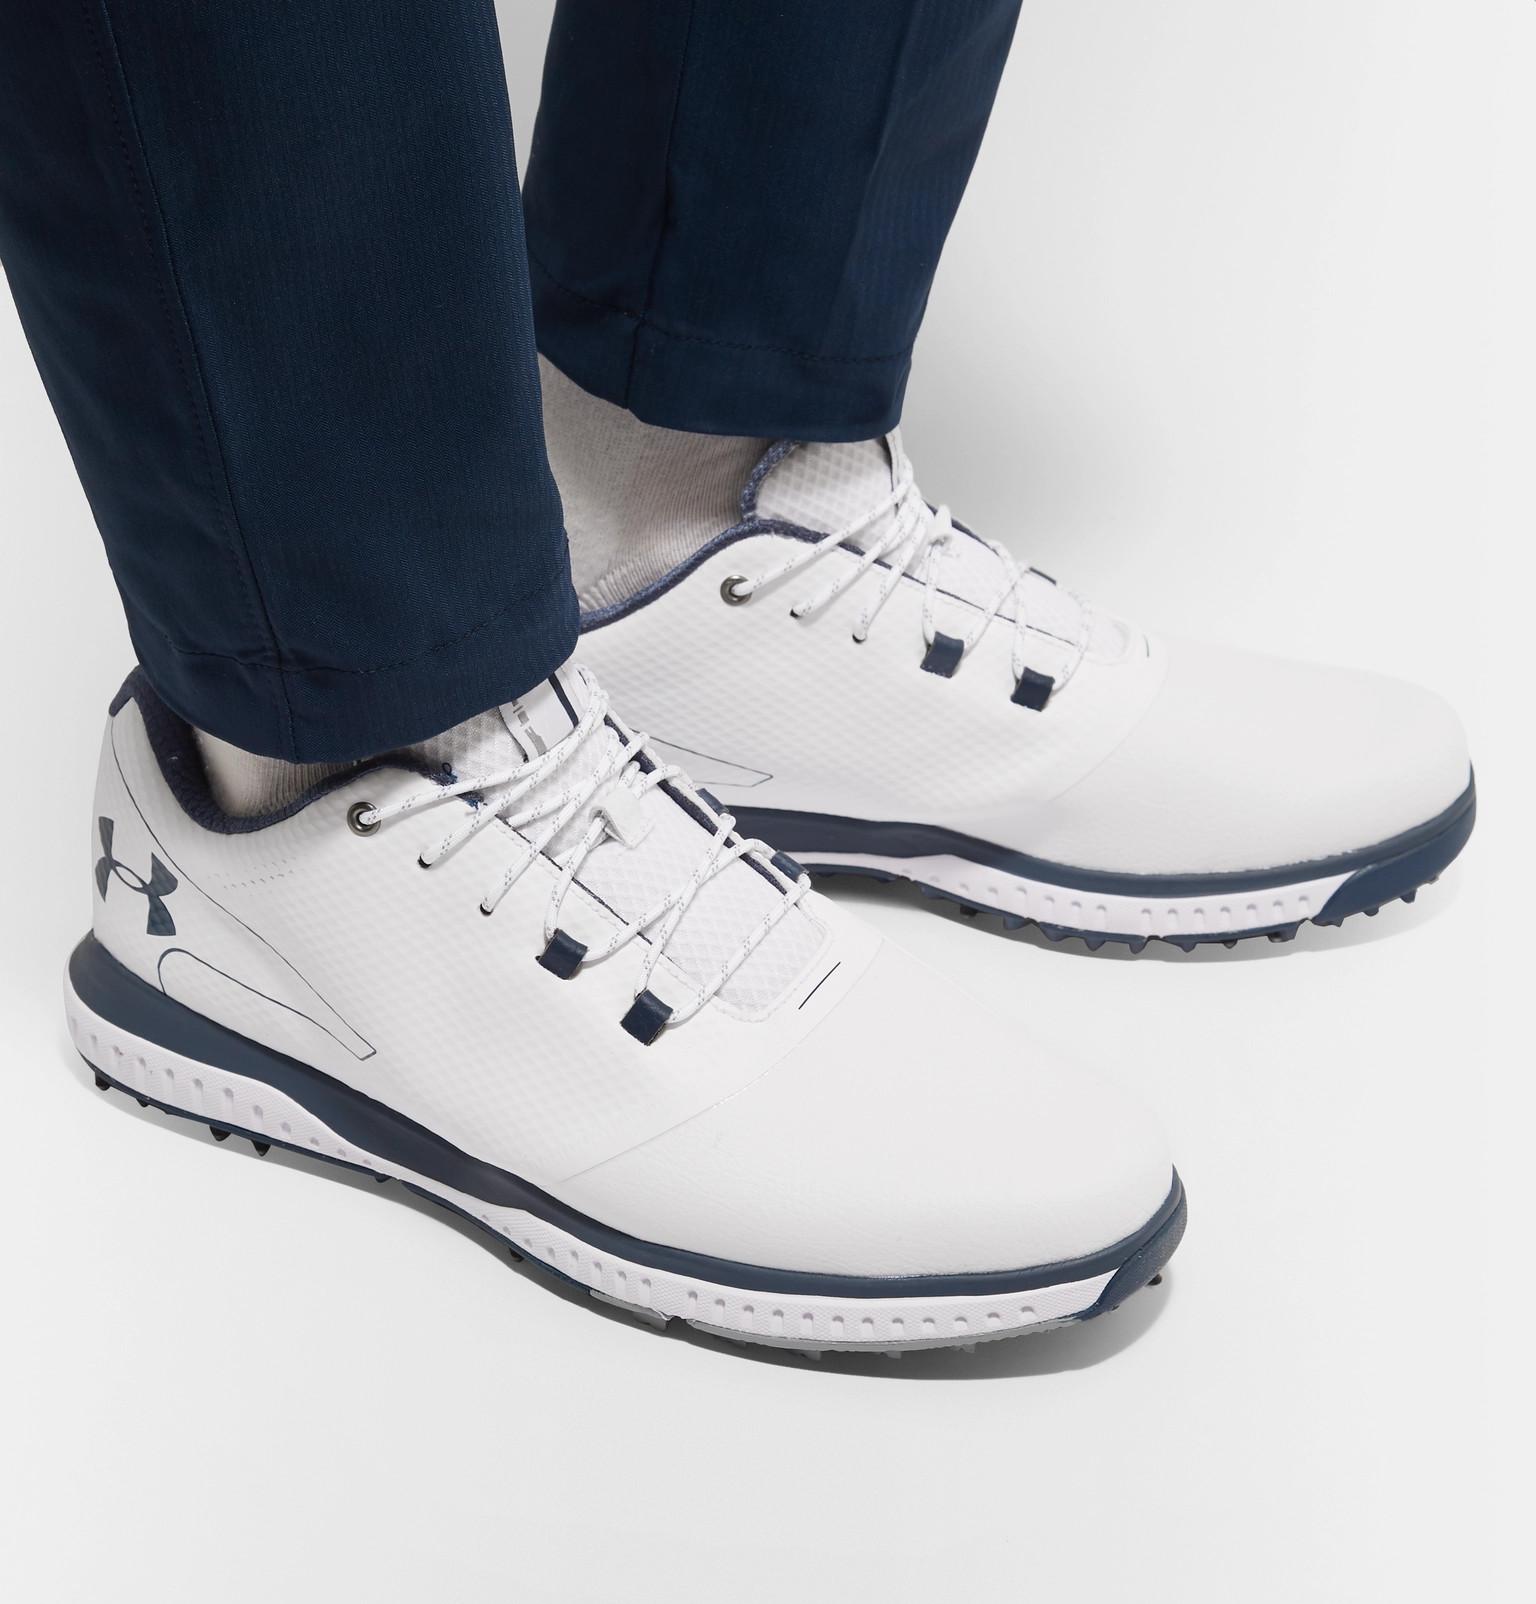 bfdcdac39 Under Armour - Fade RST 2 E Golf Shoes